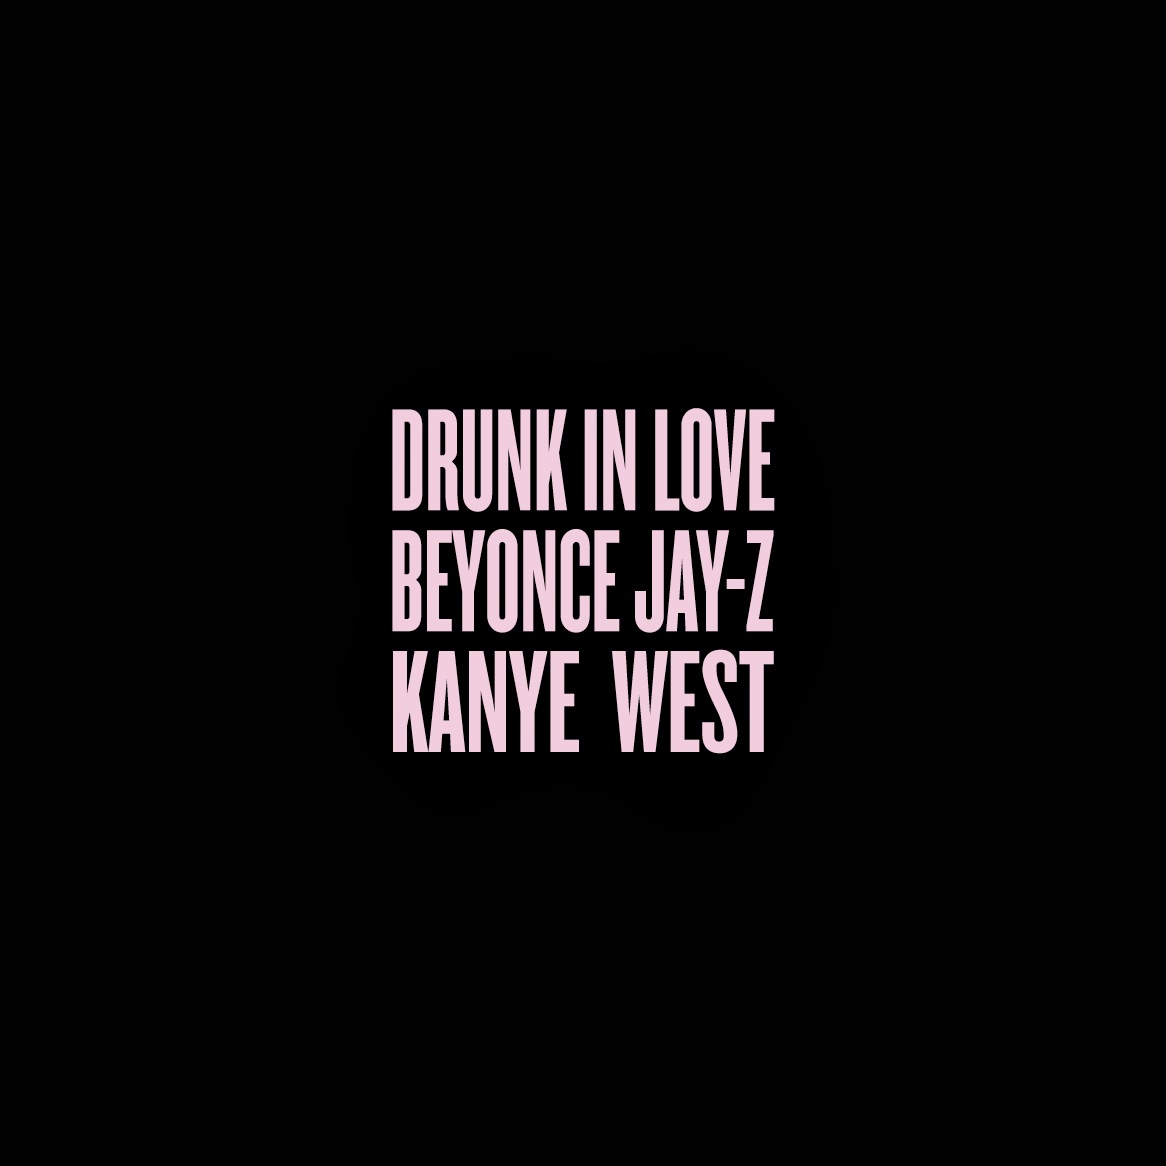 Drunk in love diplo remix album cover